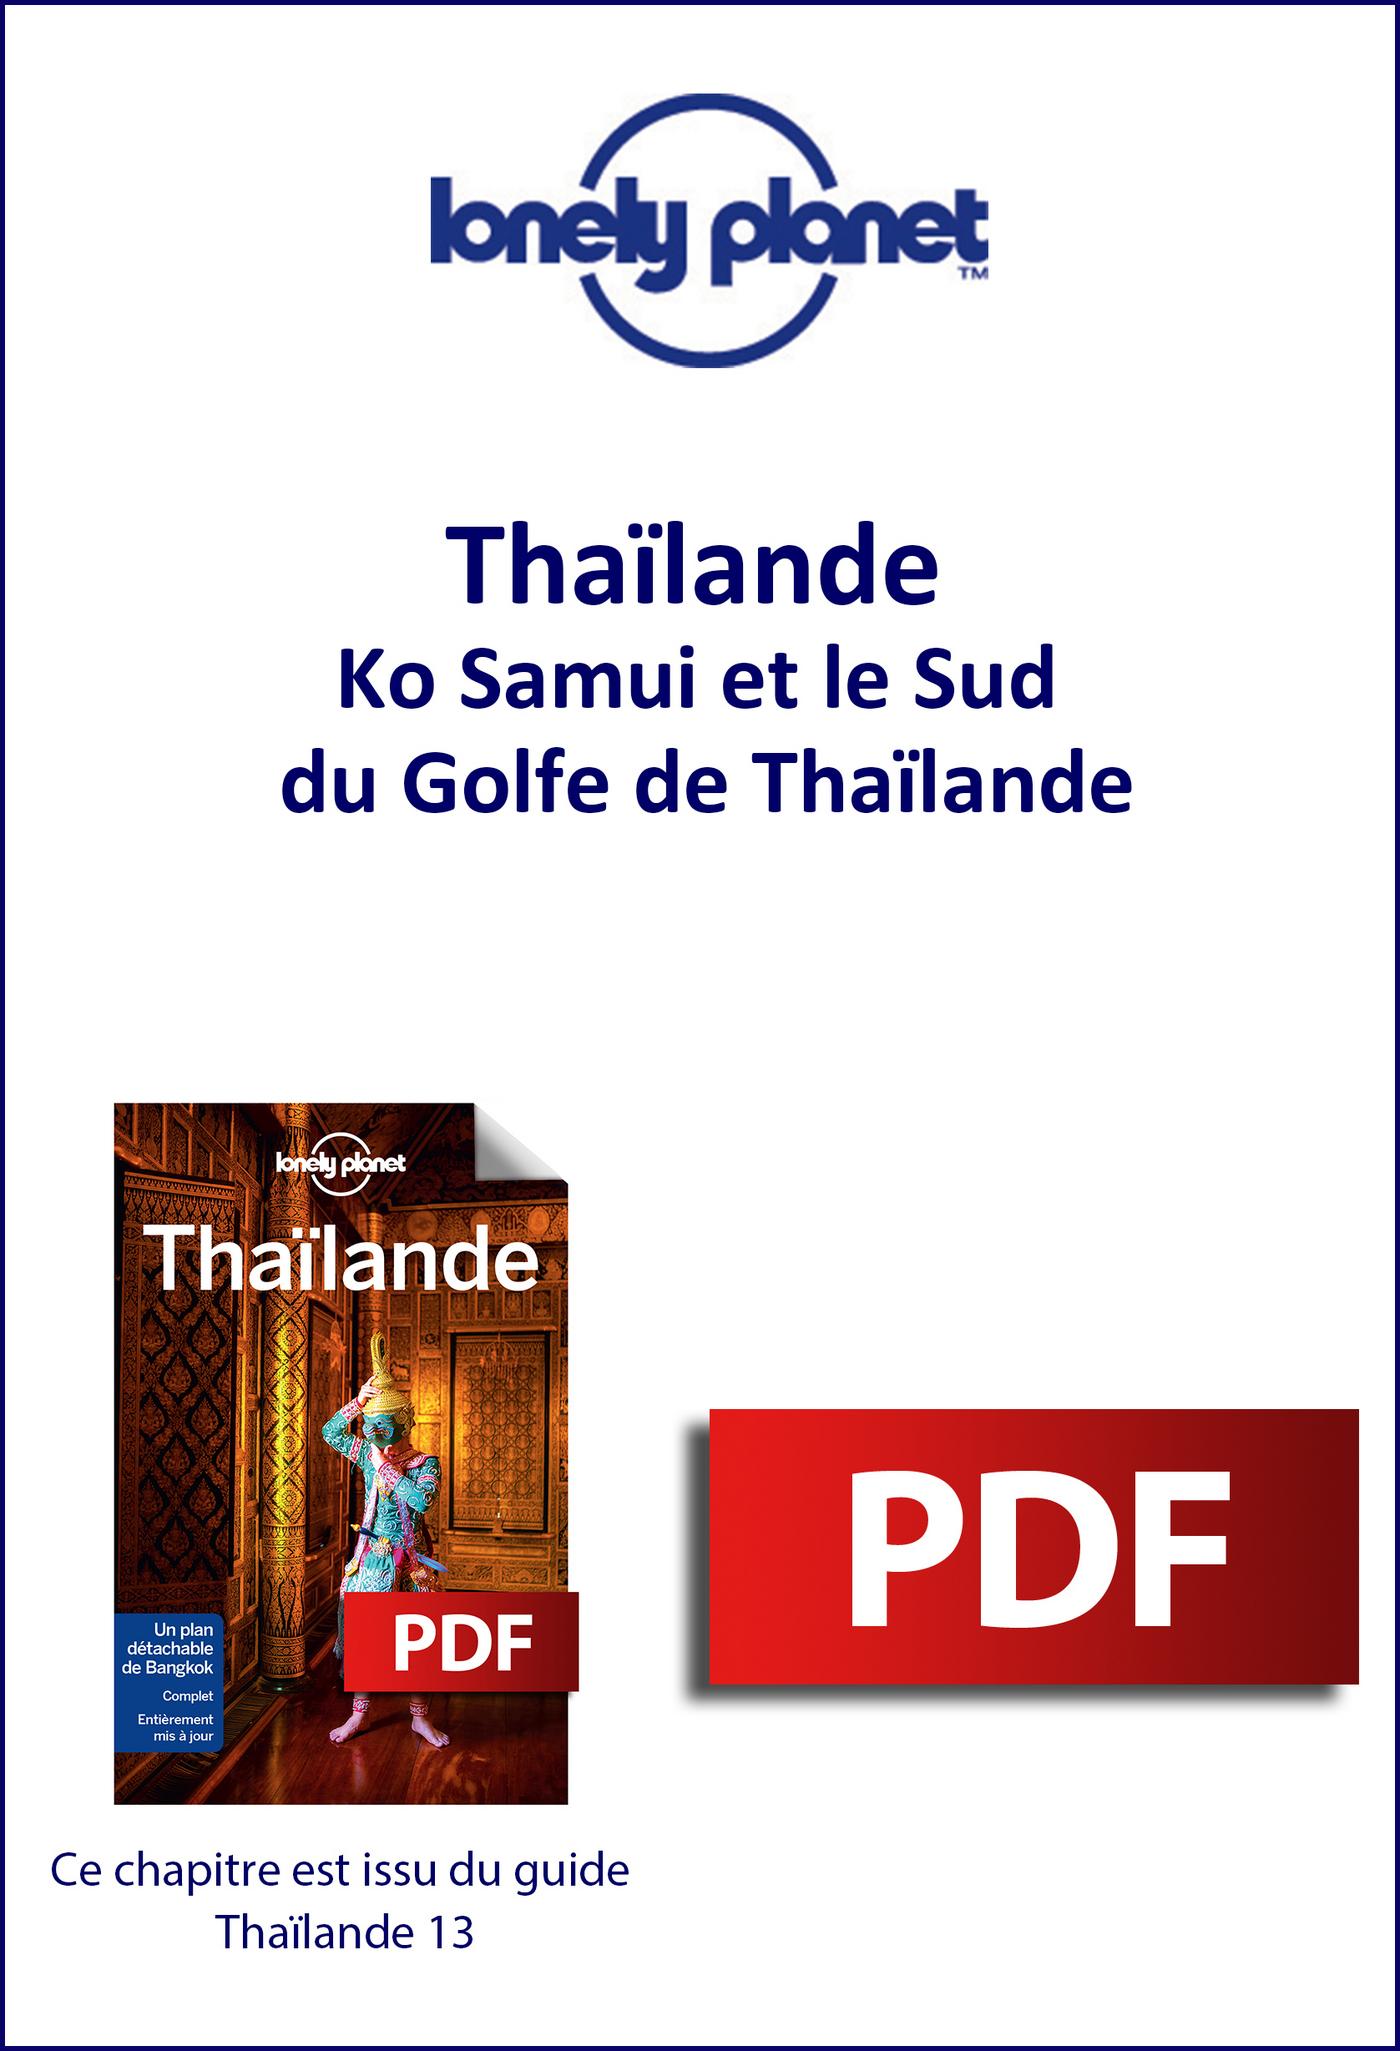 Thaïlande - Ko Samui et le Sud du Golfe de Thaïlande